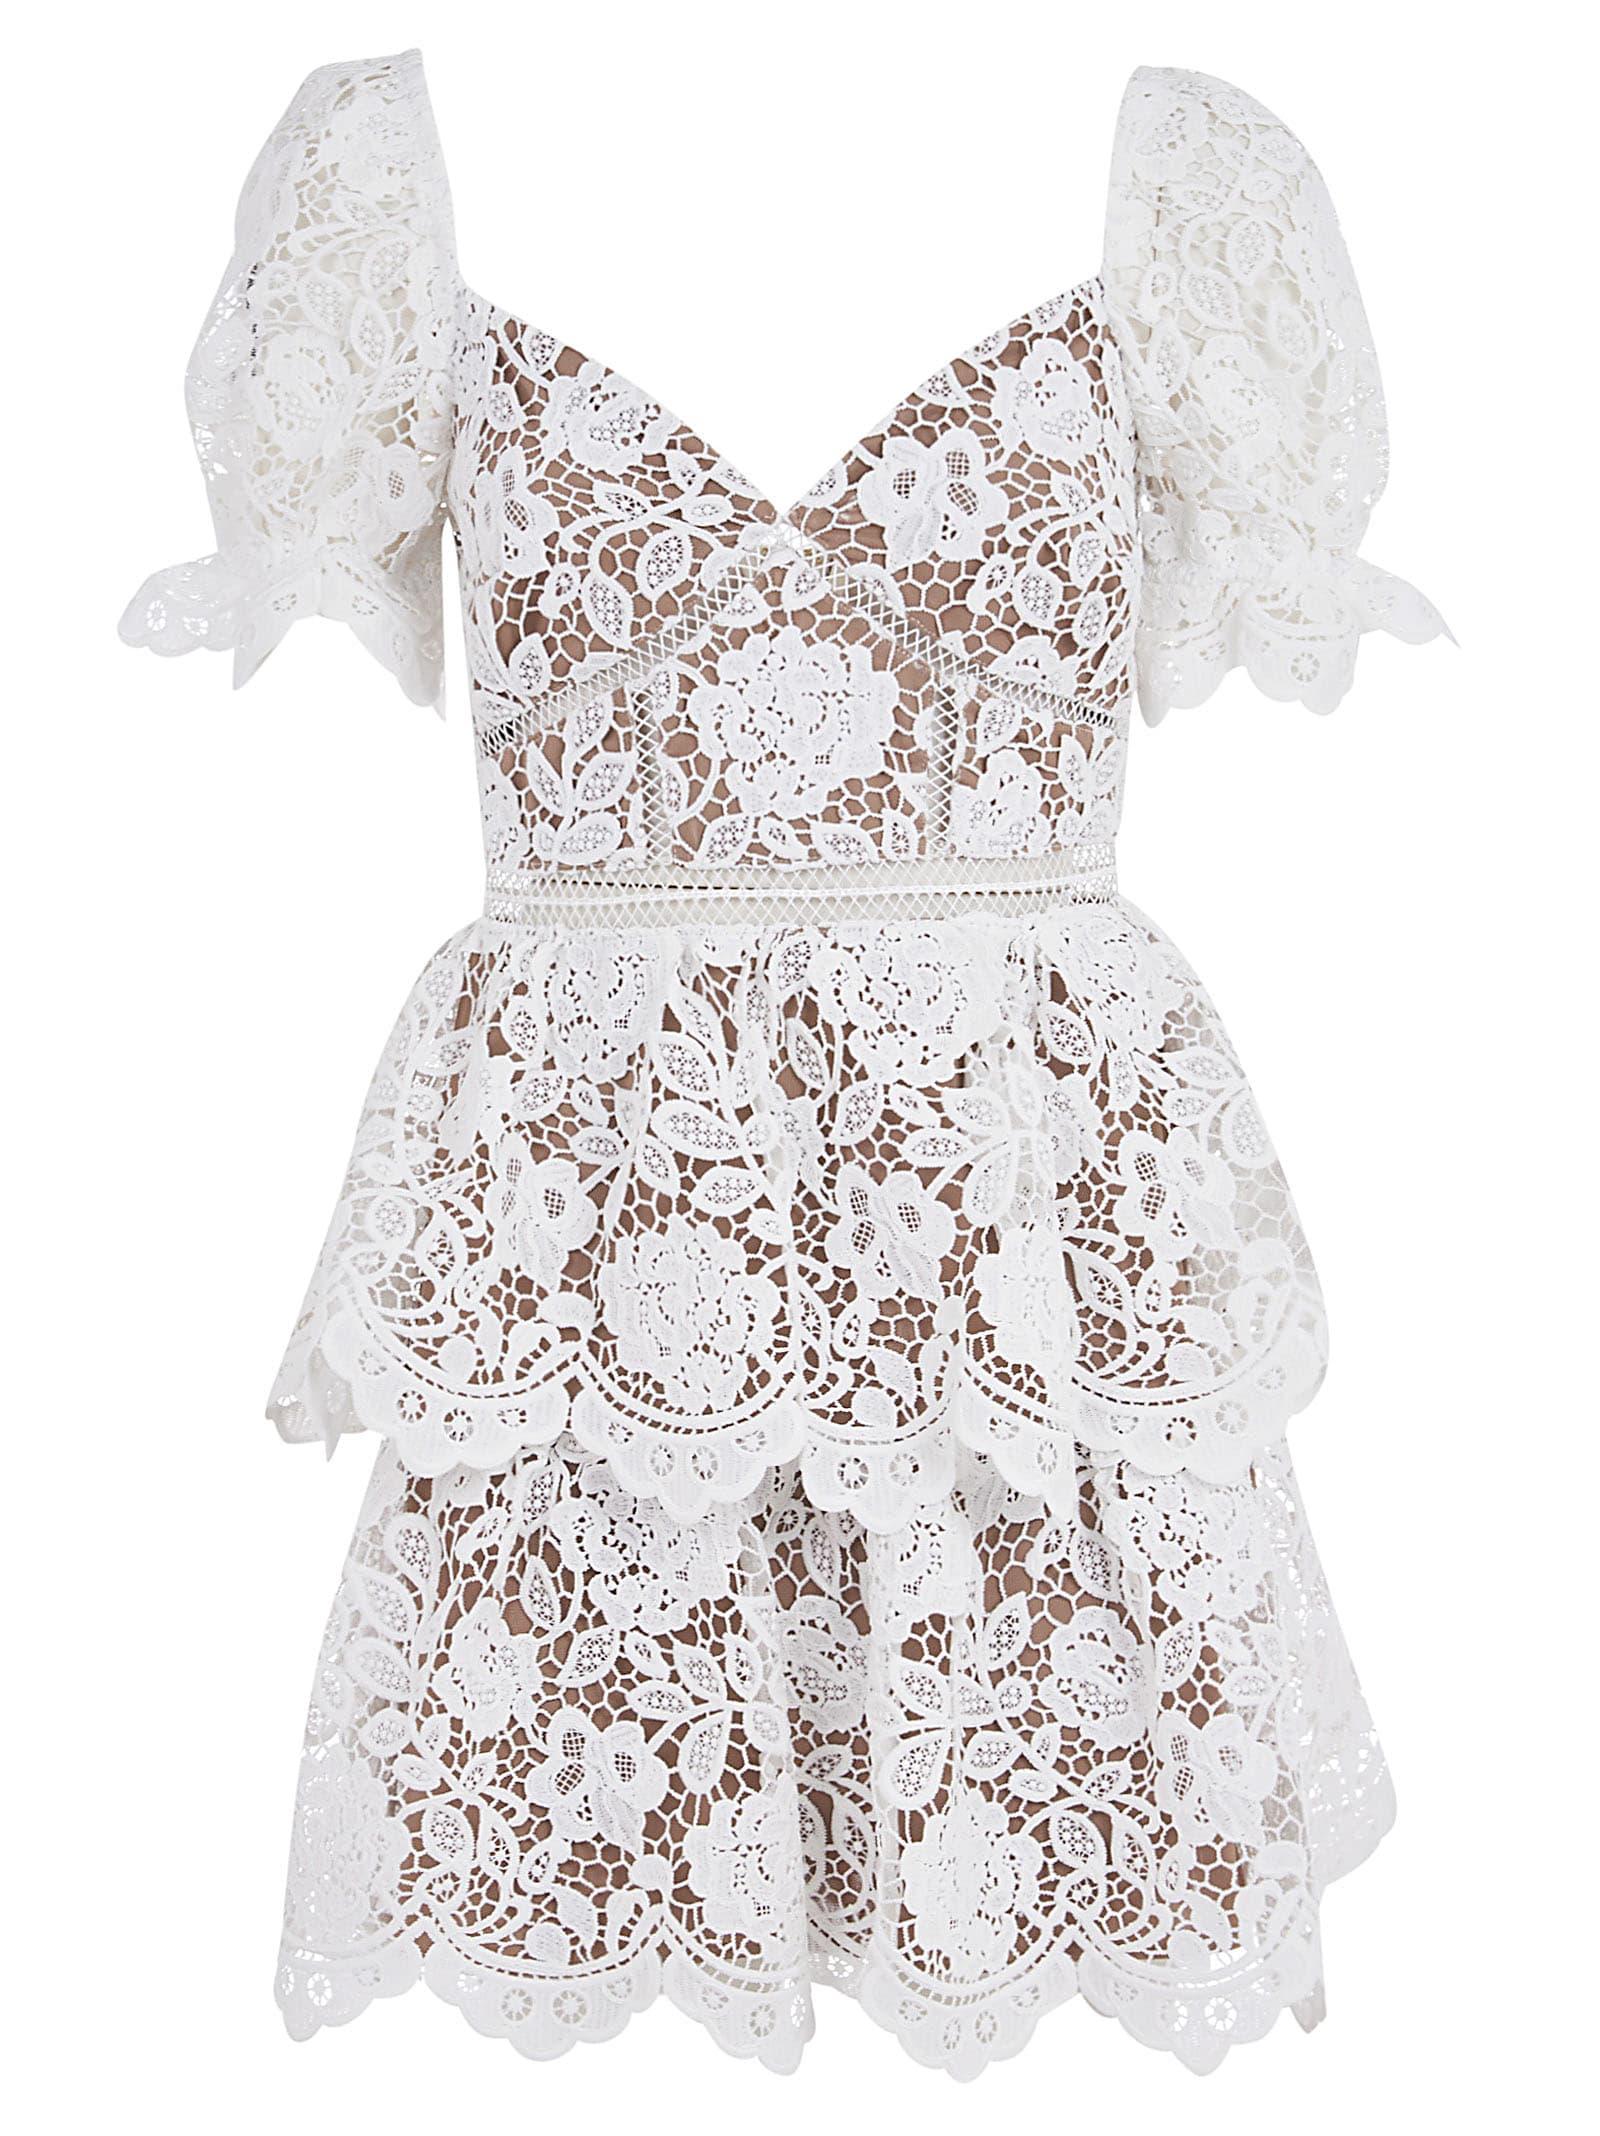 Buy self-portrait White Flower Lace Mini Dress online, shop self-portrait with free shipping